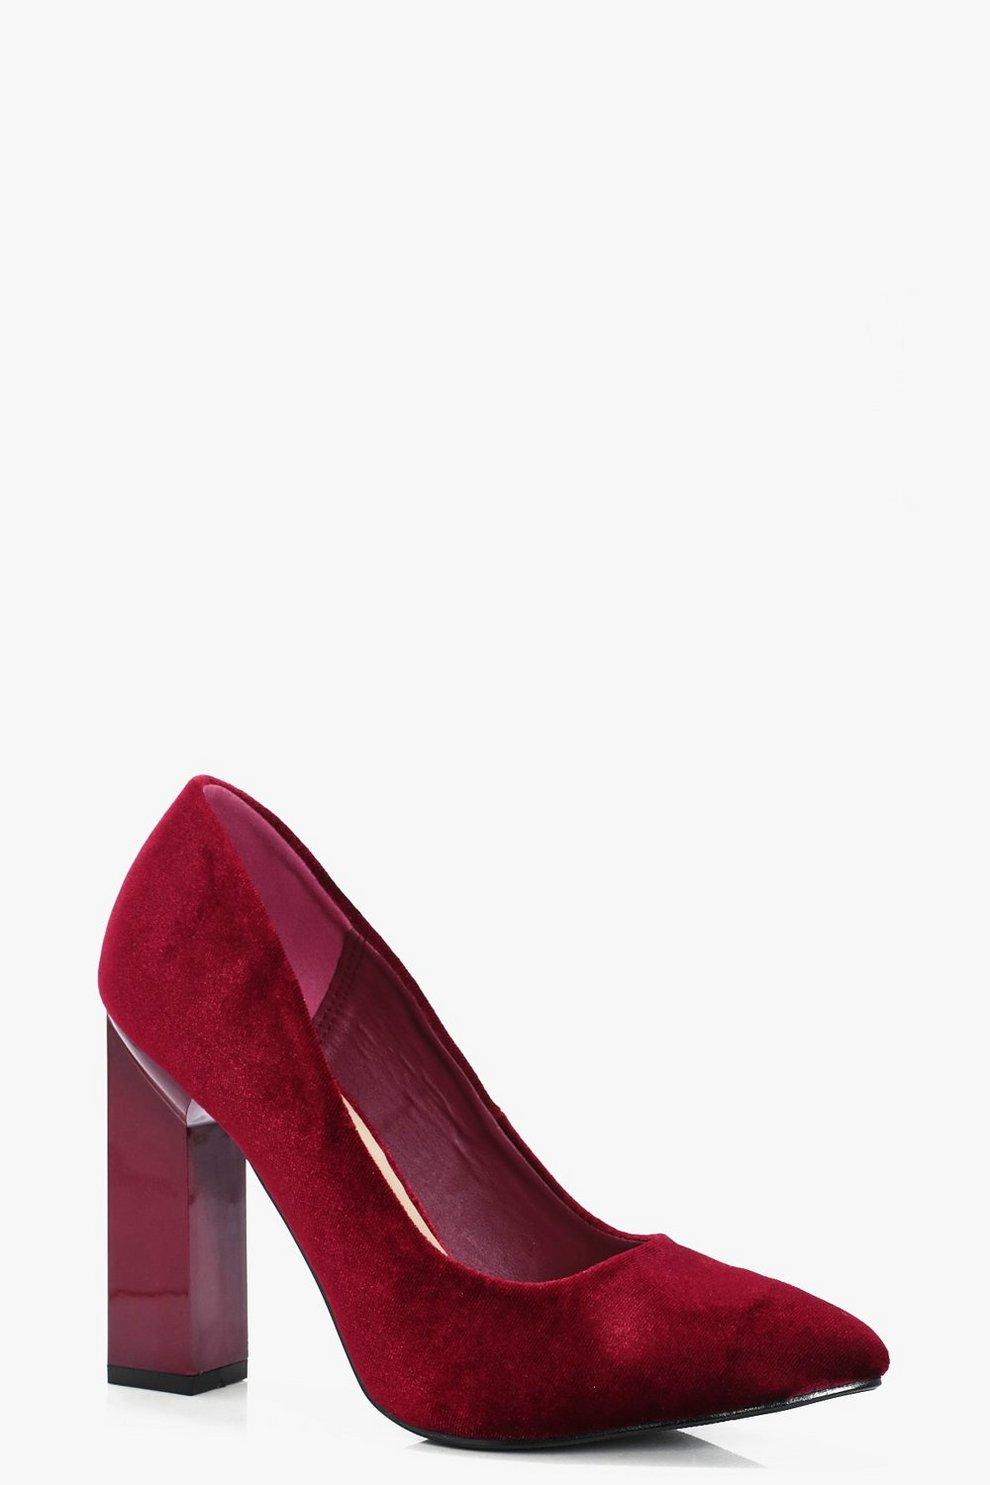 baf35837033 Pointed Toe Block Heel Court Shoes